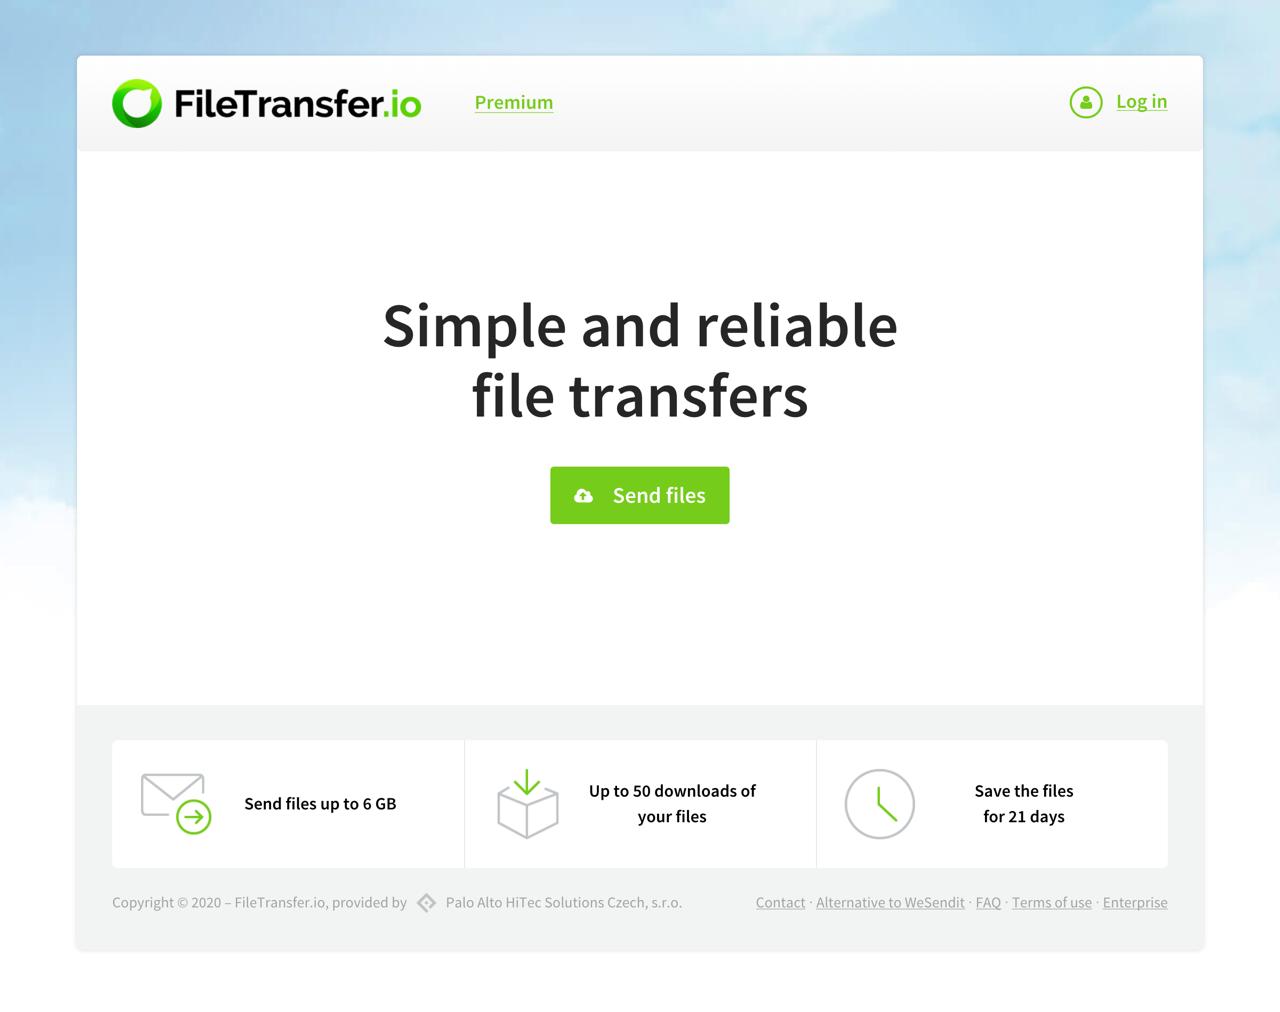 FileTransfer.io 最快速簡單的免費空間推薦,6 GB 上傳限制可保存 21 天